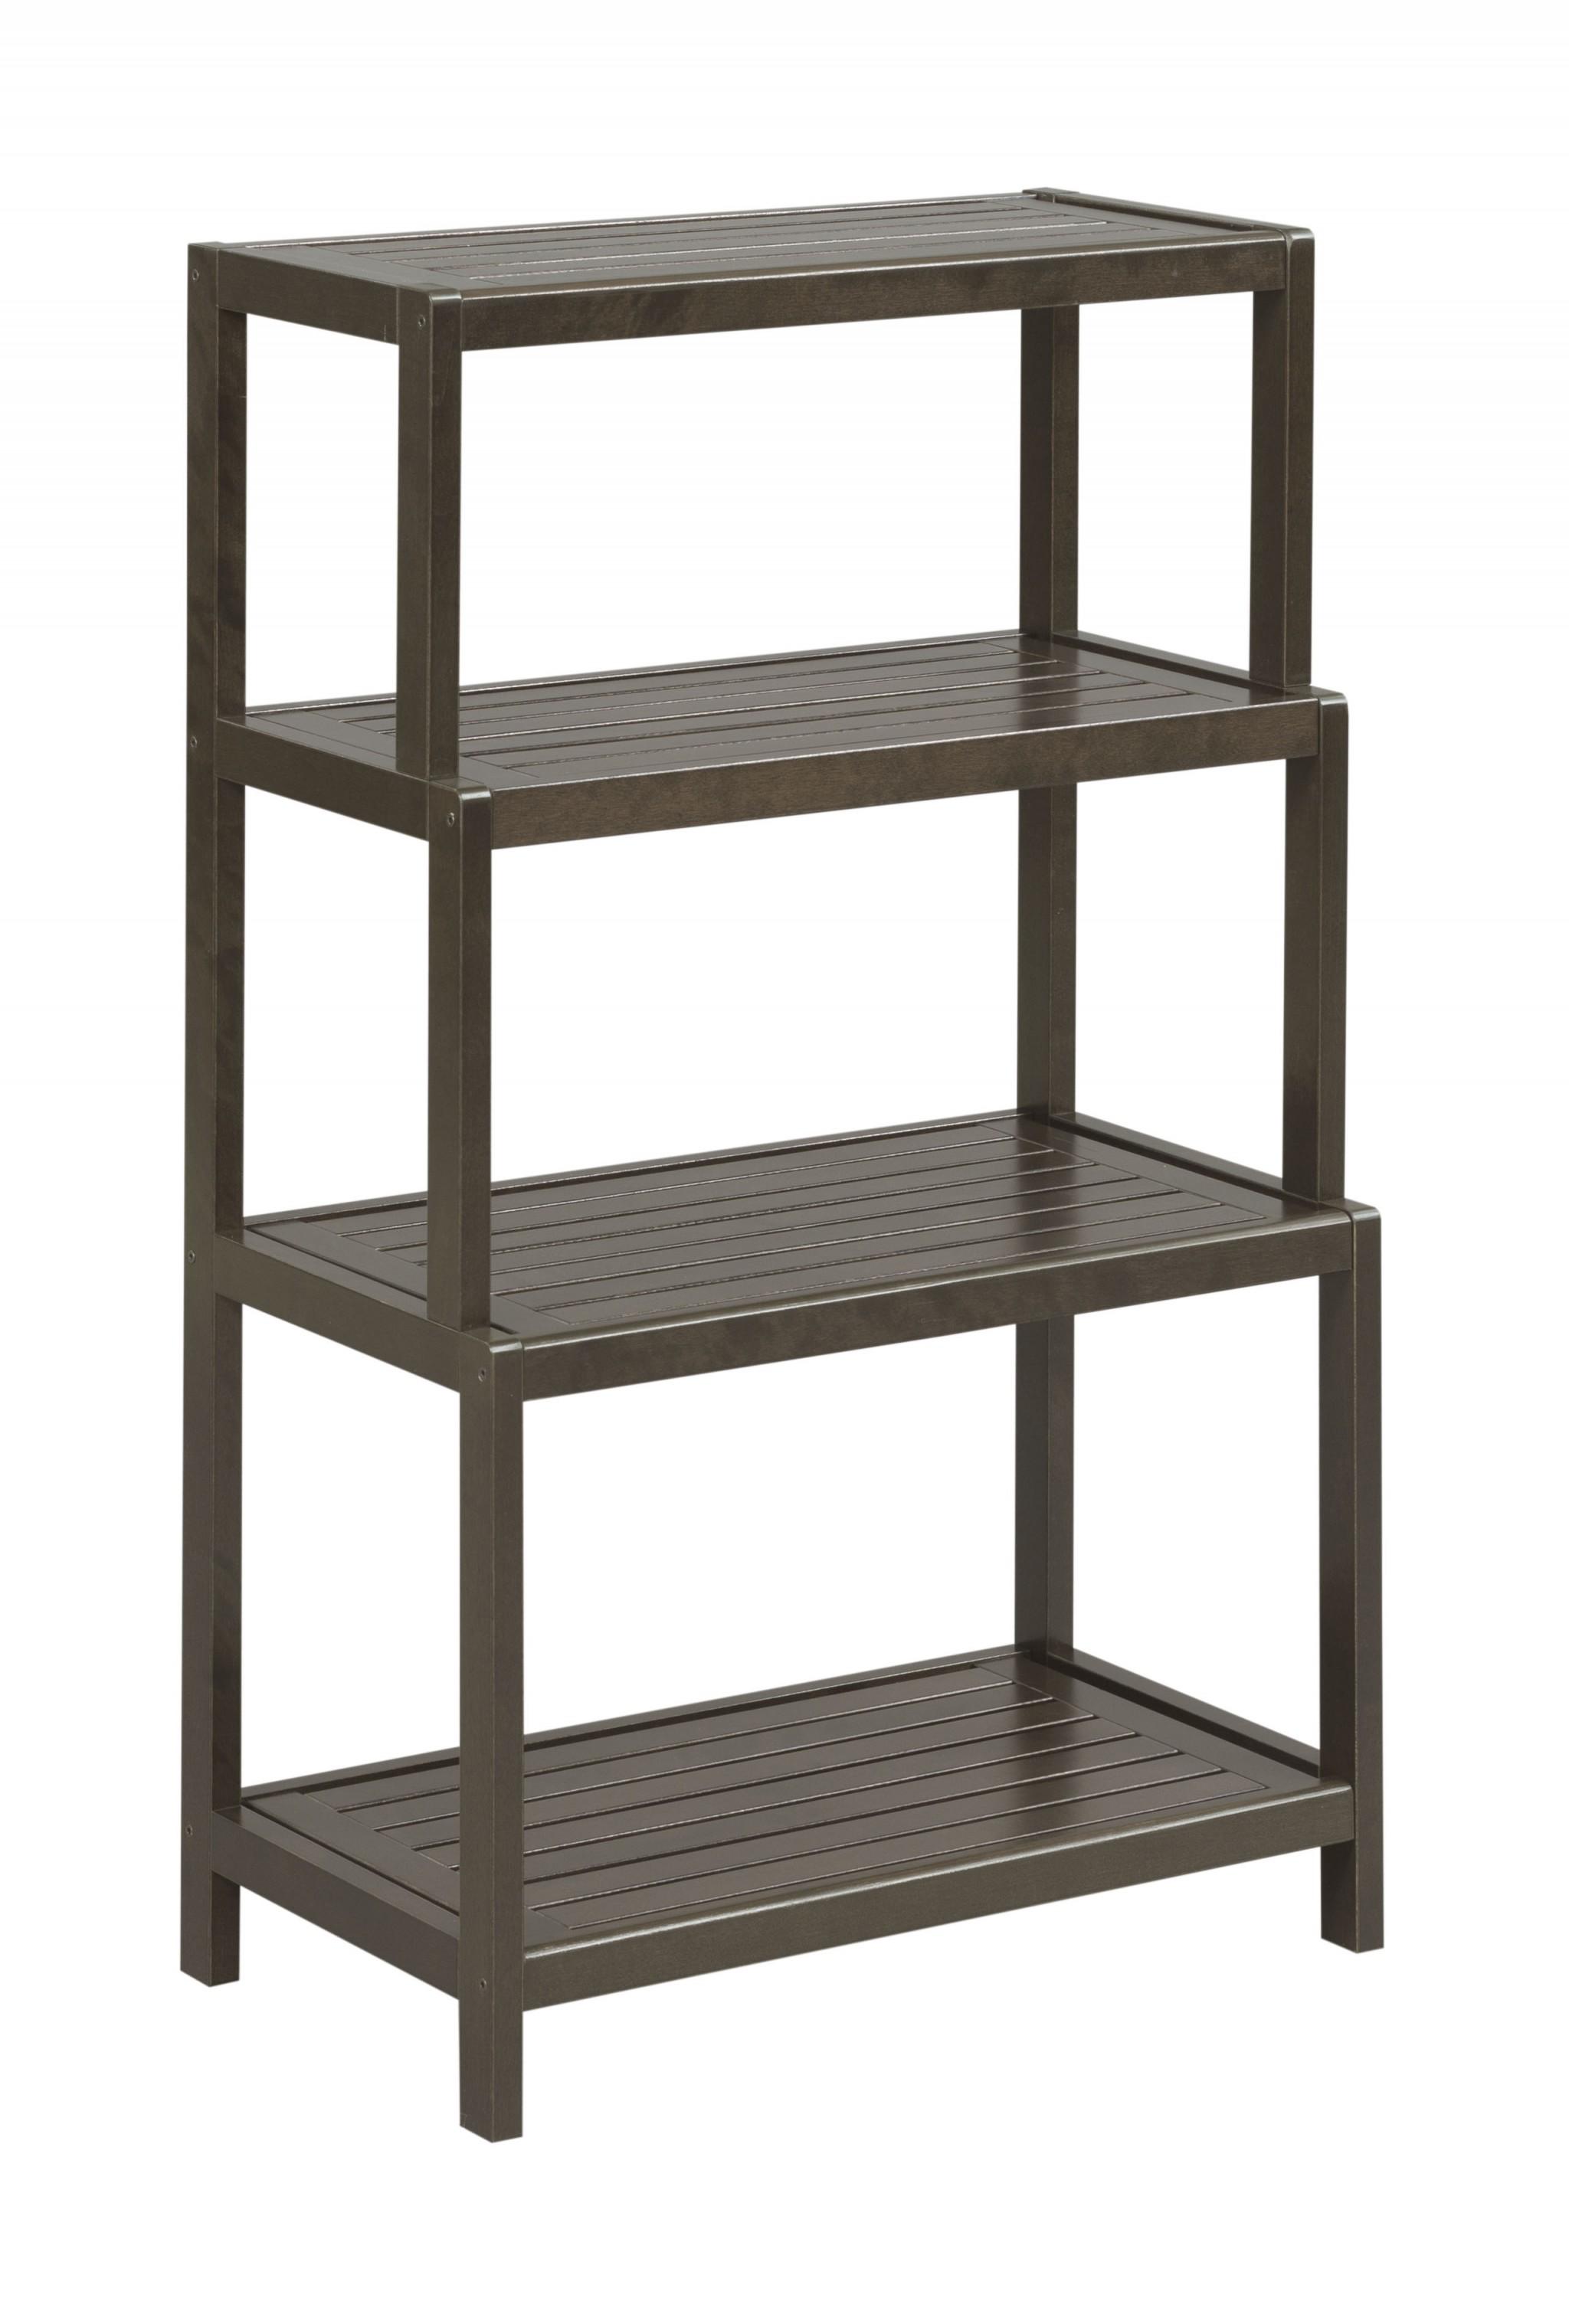 "37"" Bookcase with 4 Shelves in Espresso"